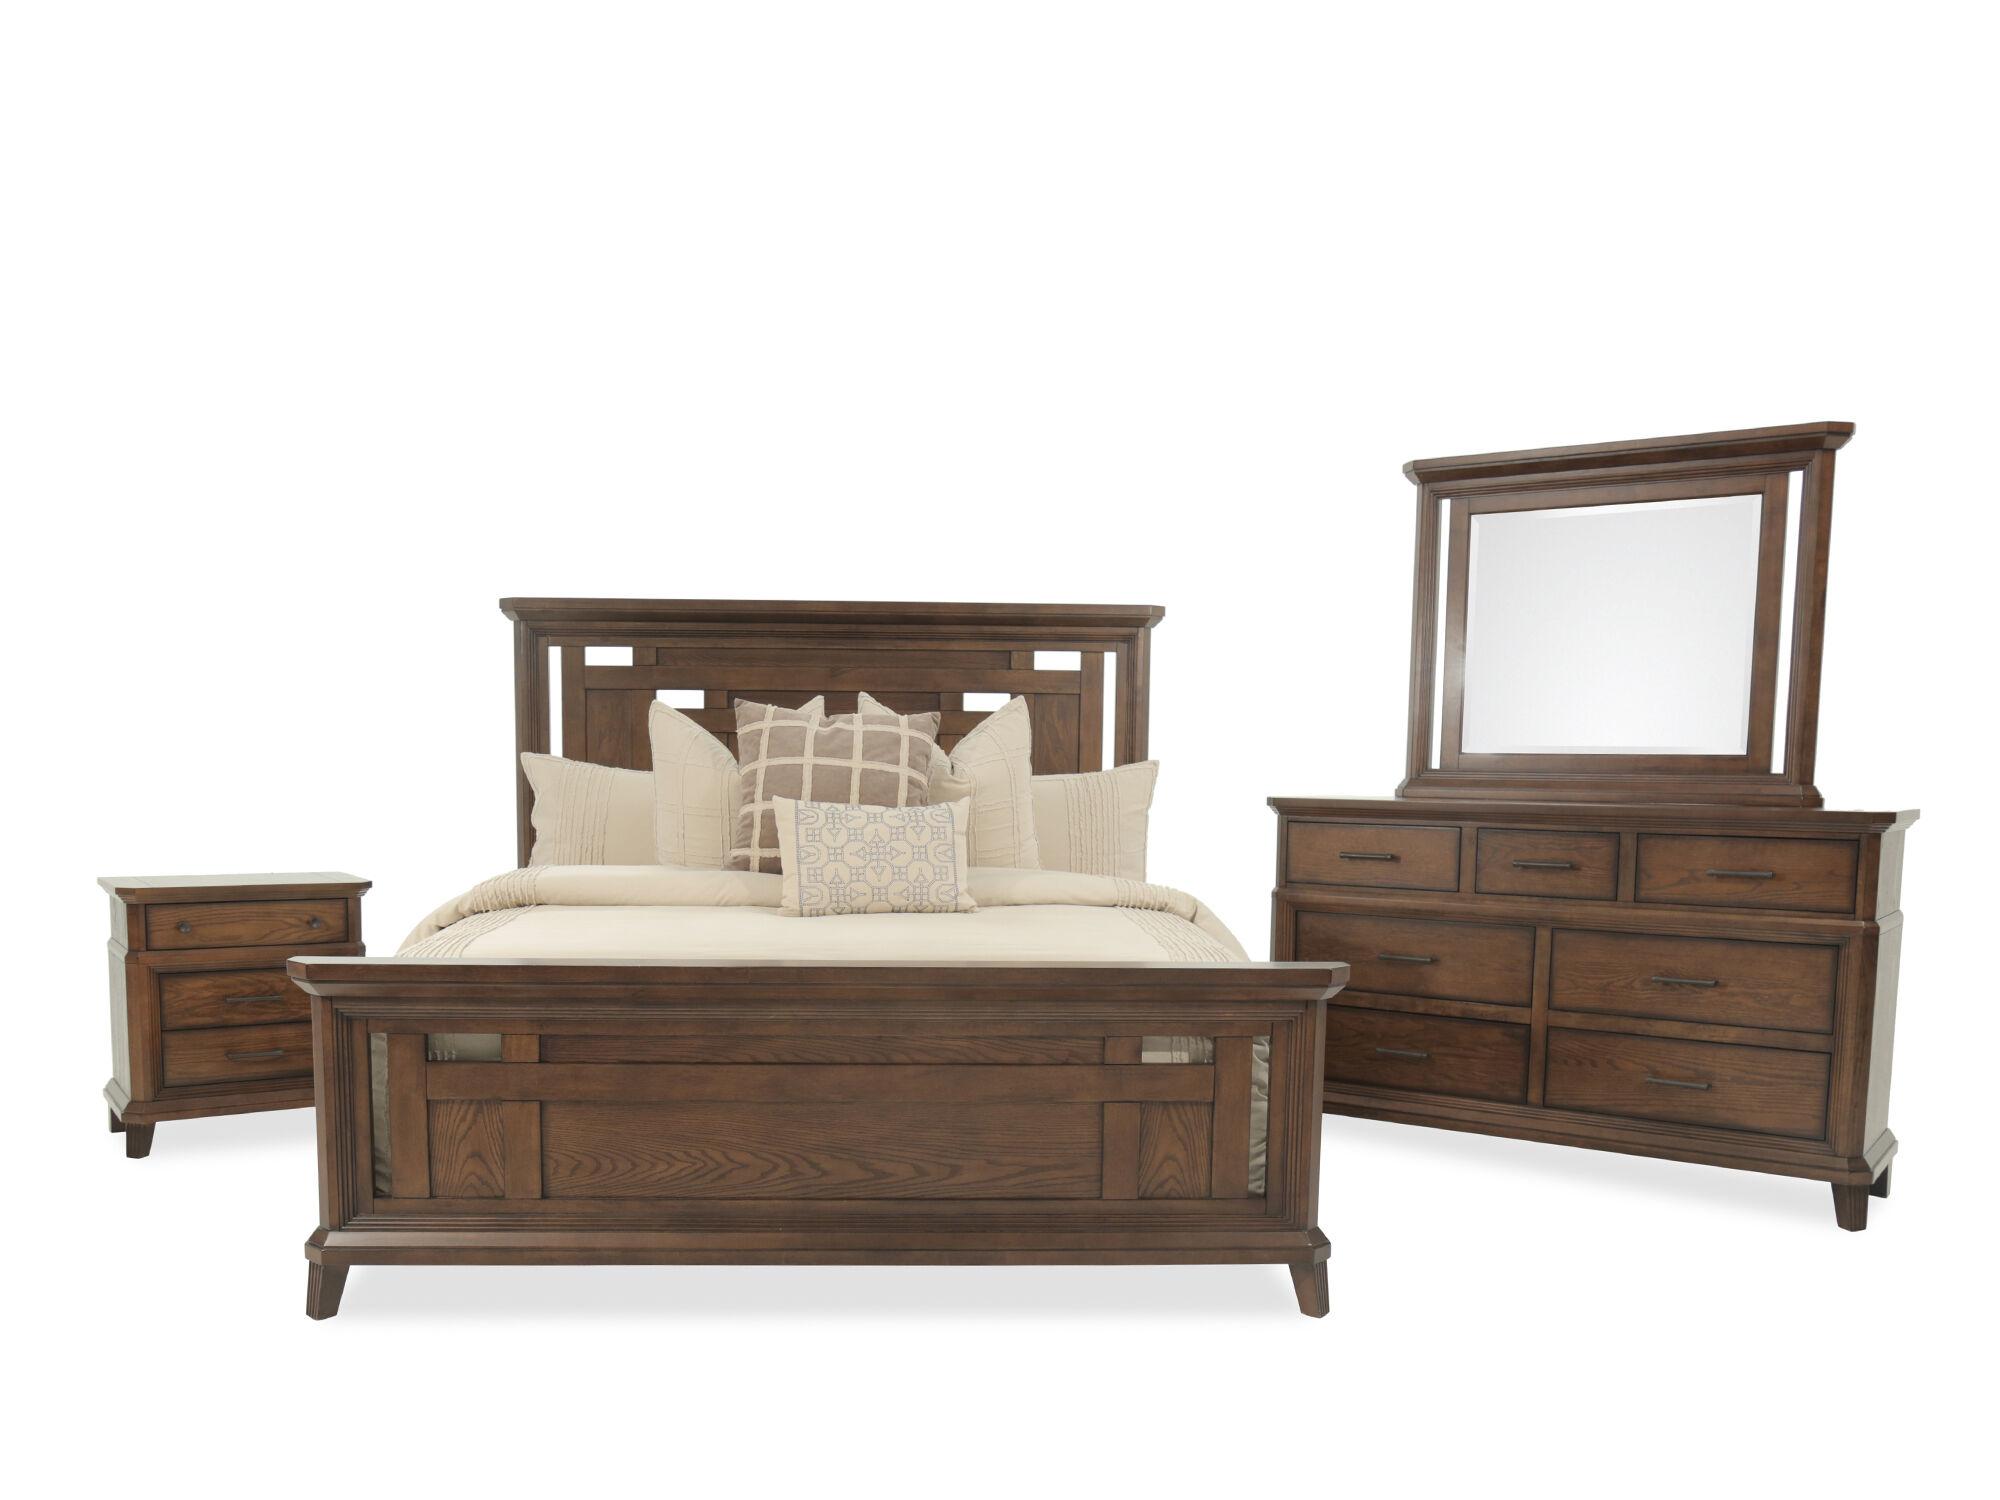 Merveilleux ... Four Piece Mission Bedroom Set In Brown ...